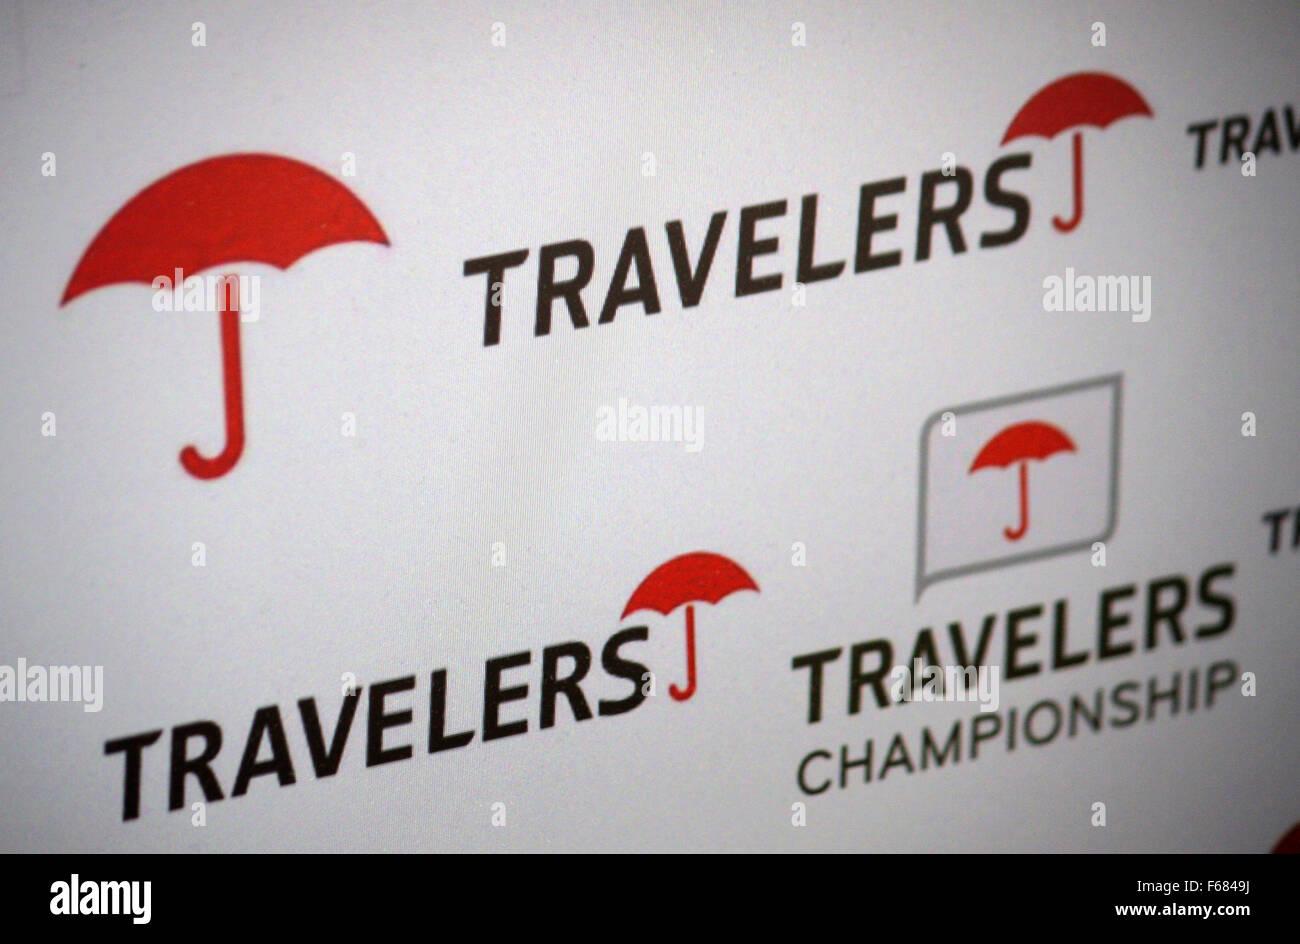 Markenname: 'Travelers', Dezember 2013, Berlin. - Stock Image